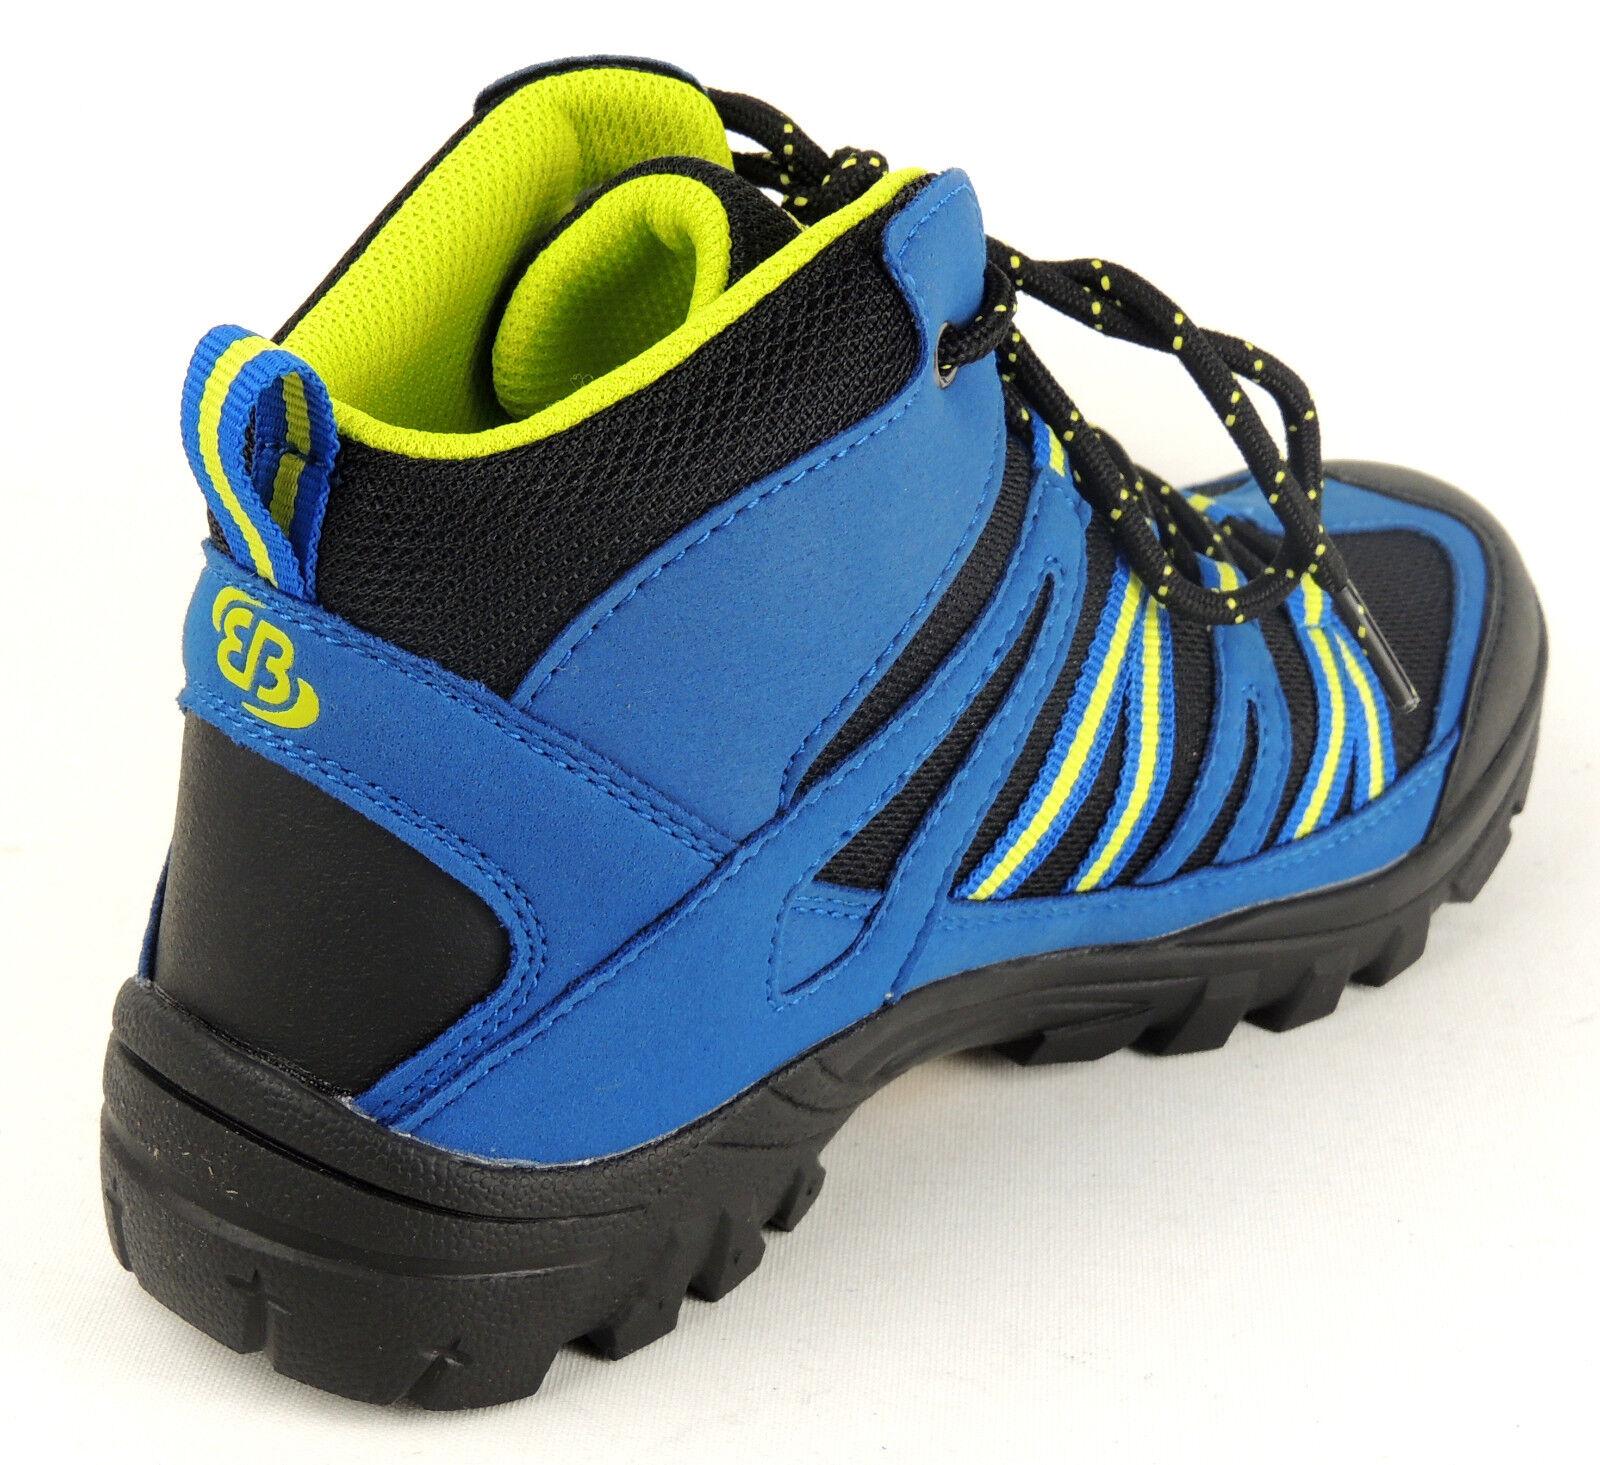 Brütting Brütting Brütting señora trekking senderismo zapatos azul Comfortex-membrana vibram cf99f5